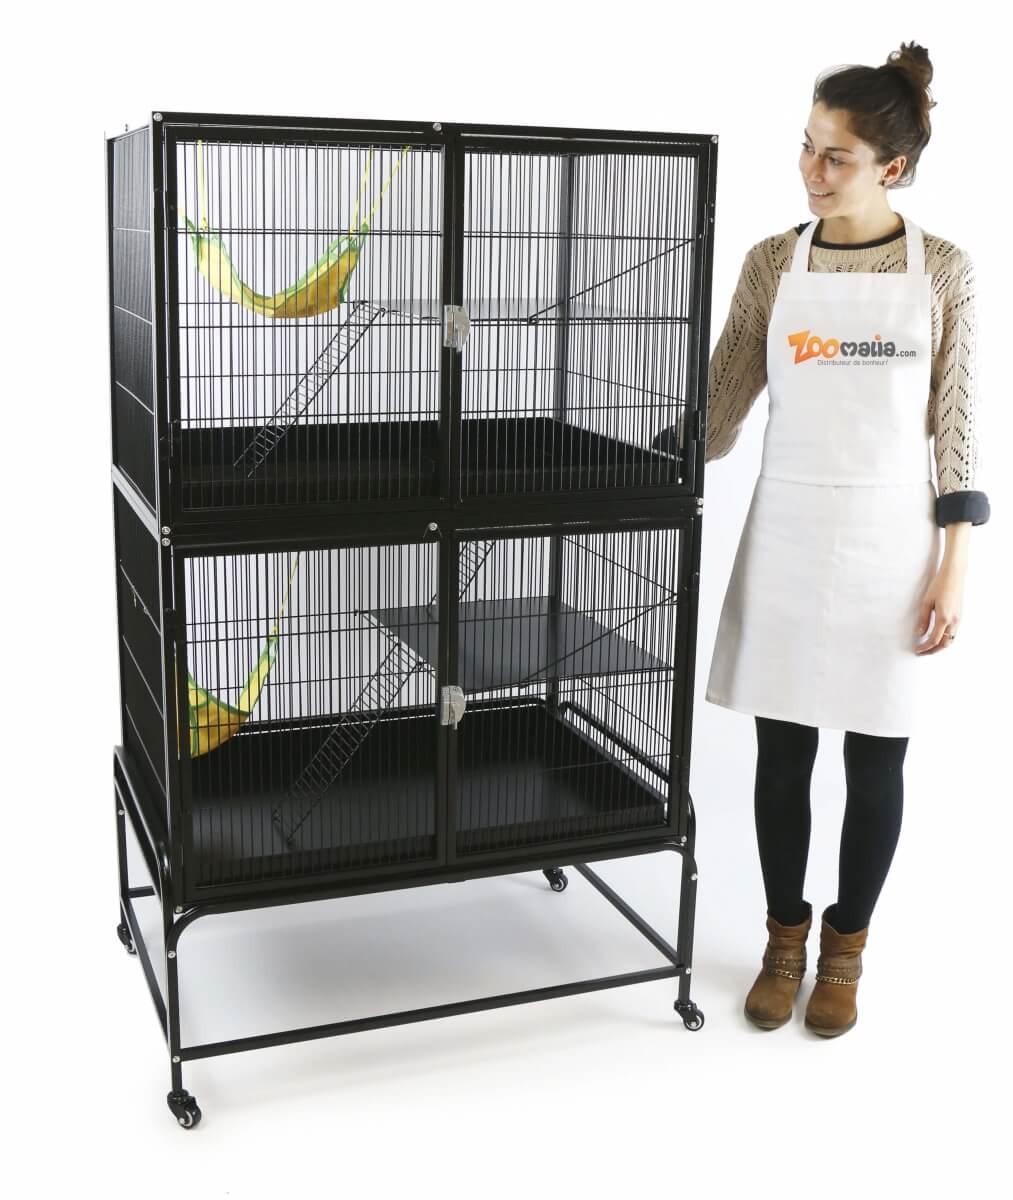 Choisir sa cage - Page 15 La_337357a6fdf7642bf815a88822c447d9dc41481188572